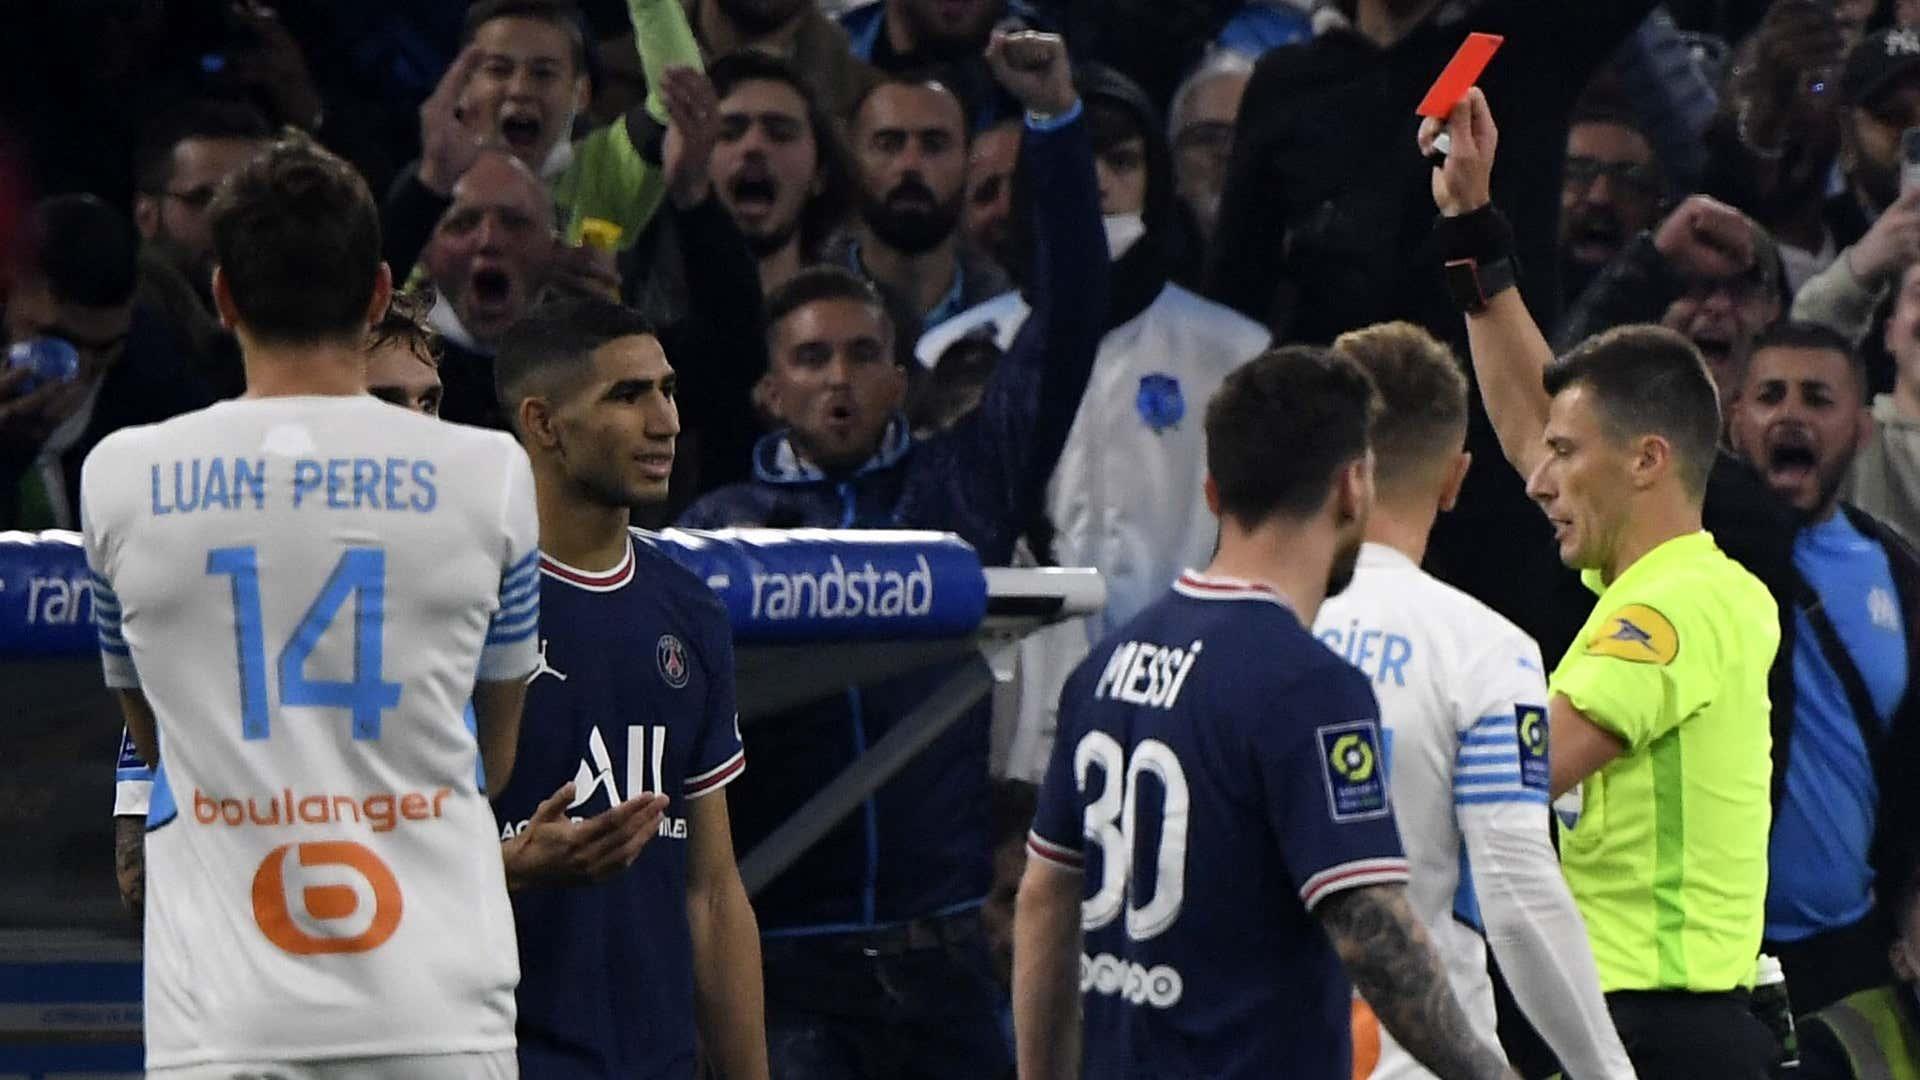 Olympique Marseille vs. Paris Saint-Germain Live-Kommentar und Ergebnis, 24.10.21, Ligue 1   Goal.com